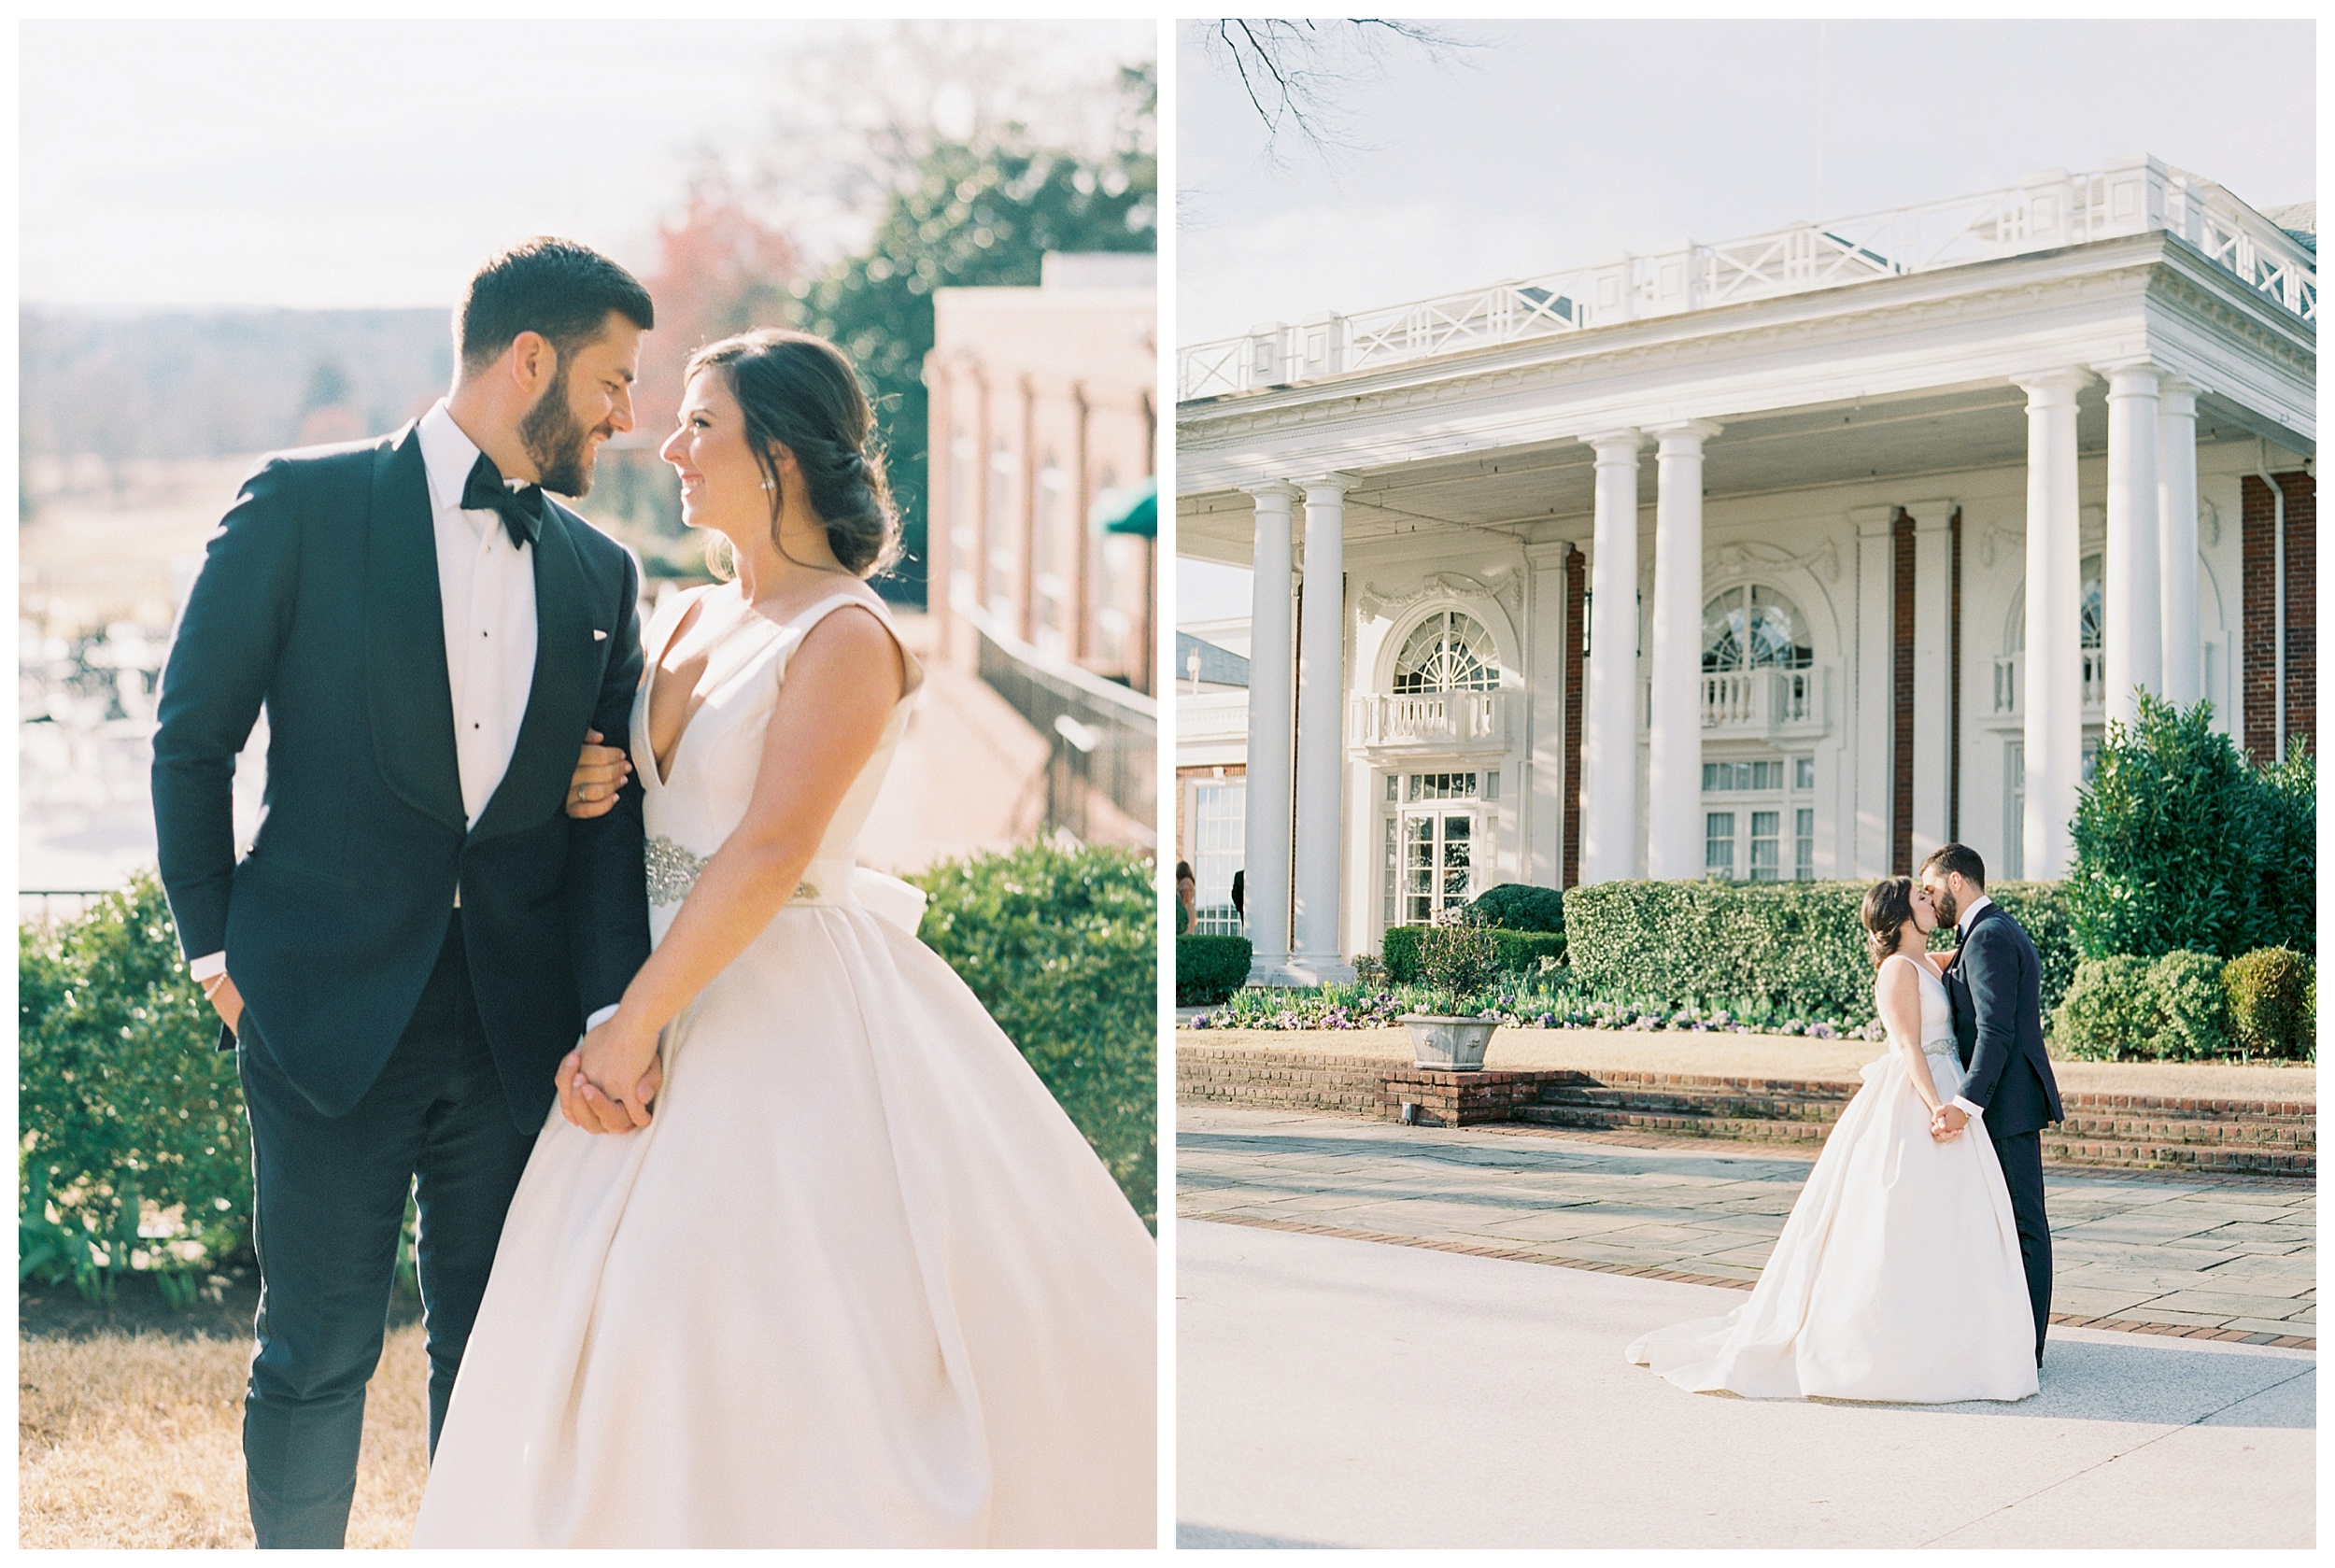 Country Club of Virginia Wedding | Richmond Wedding Photographer_0108.jpg